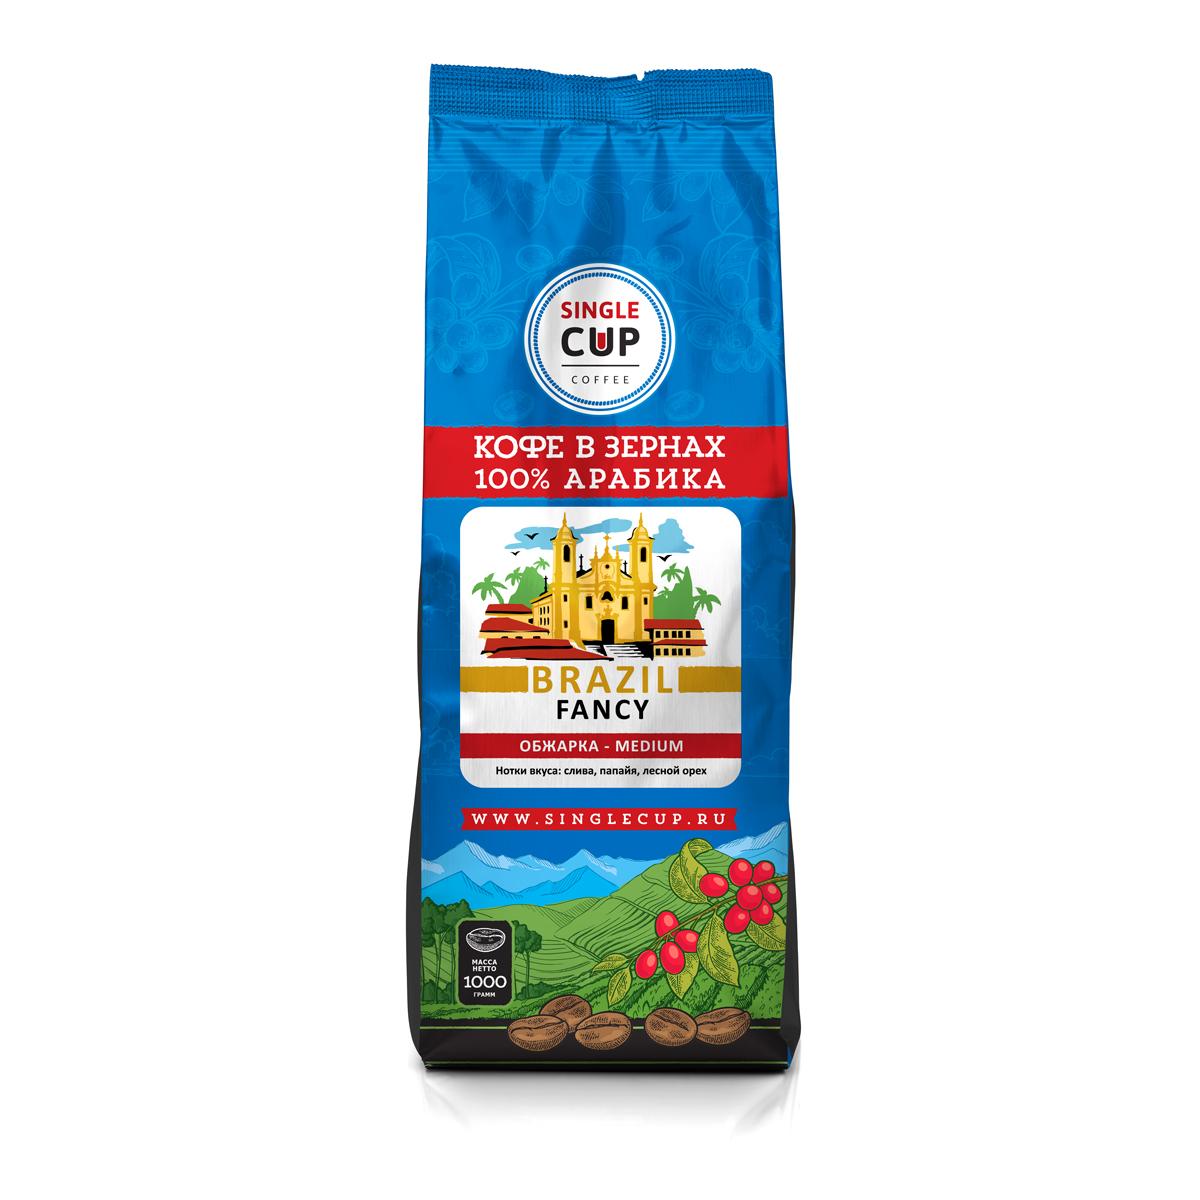 Кофе в зернах Single Cup Coffee Brazil Fancy, 1000 г